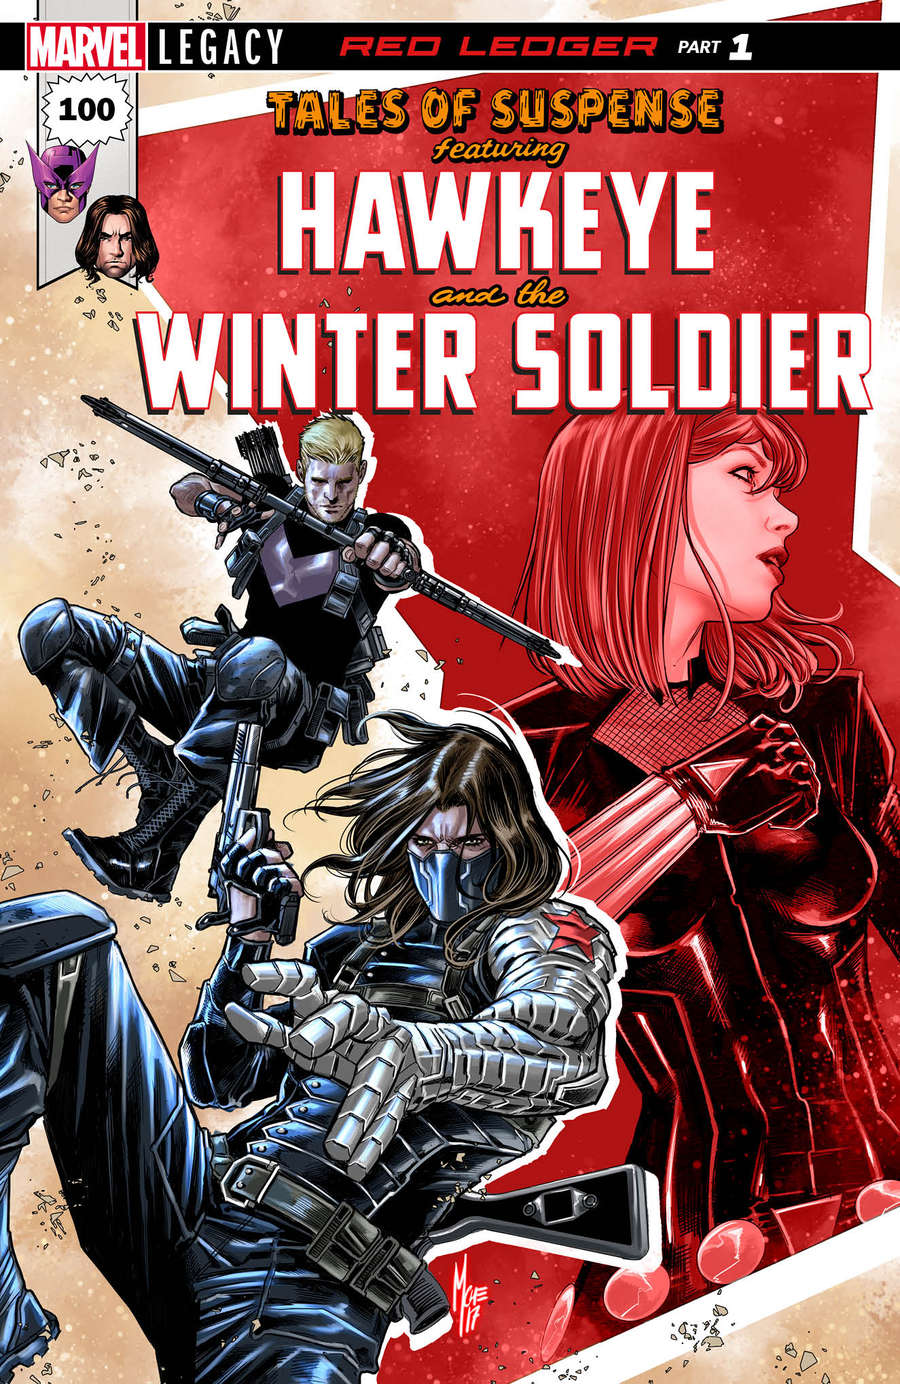 Marvel-Comics-Tales-Of-Suspense-100-Red-Ledger-Pt-1-cover